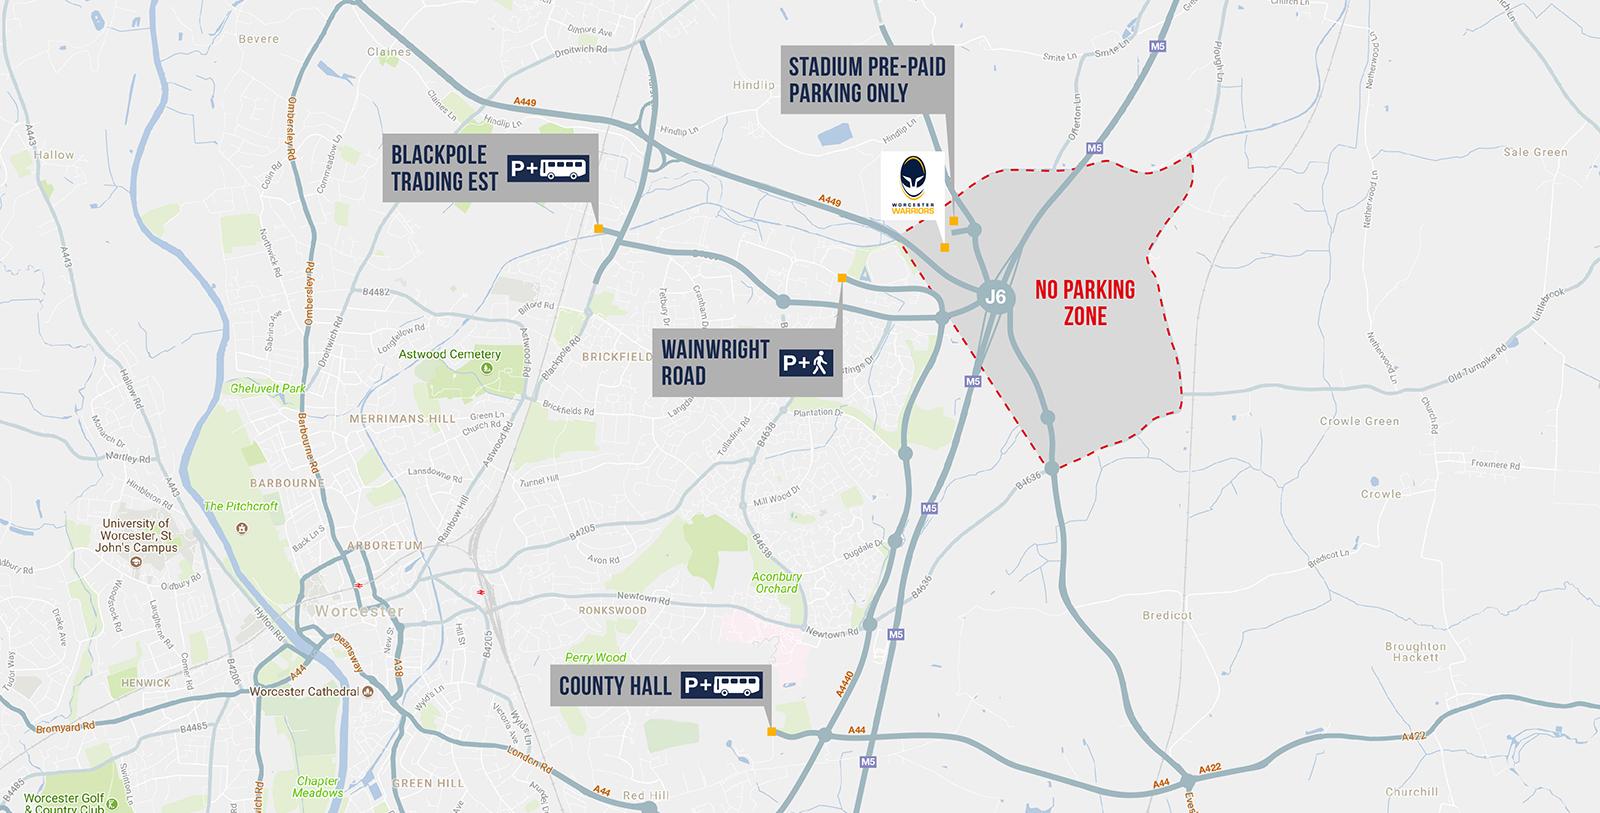 Uk Parking Map Travel & Parking – Worcester Warriors